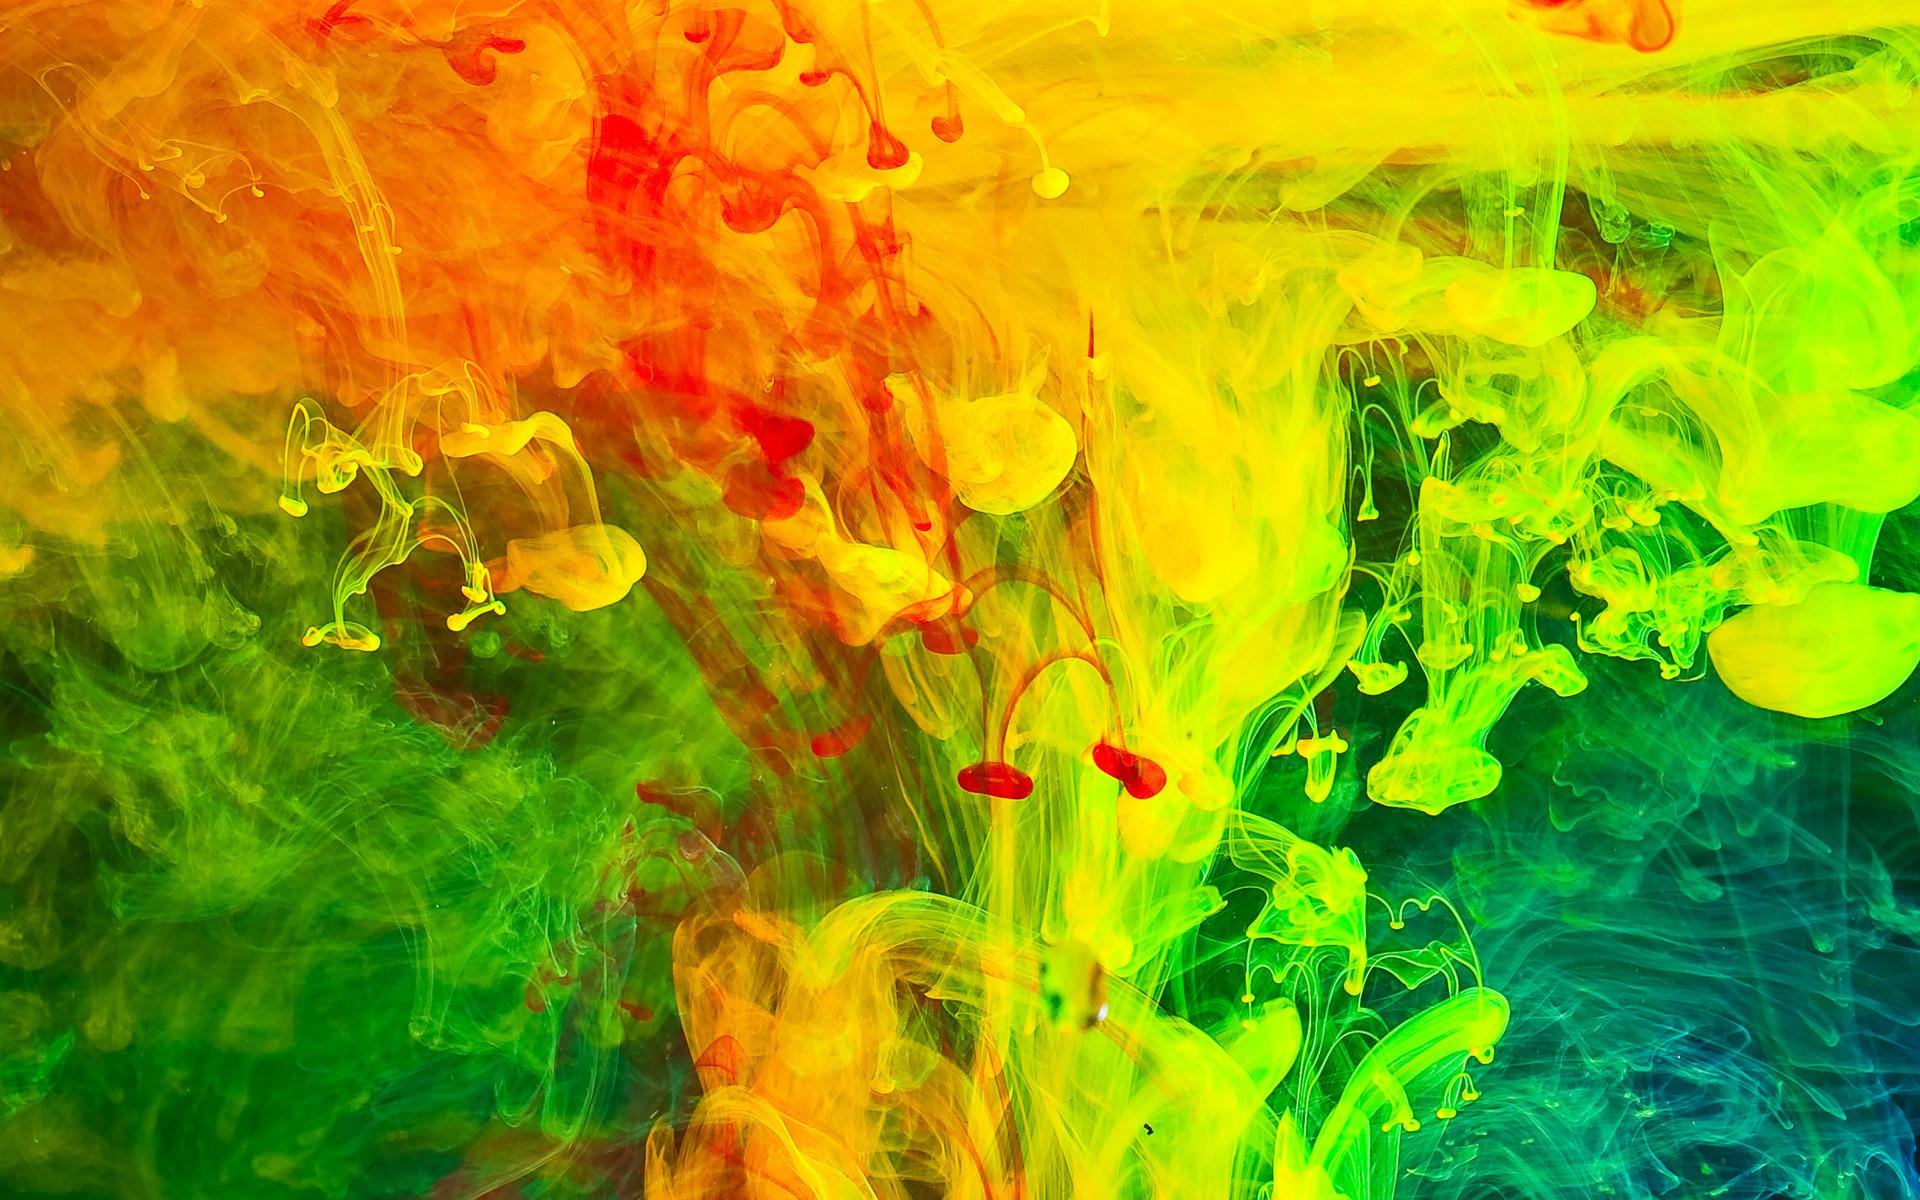 Abstract Artistic Wallpaper · Artistic Desktop Wallpaper ...